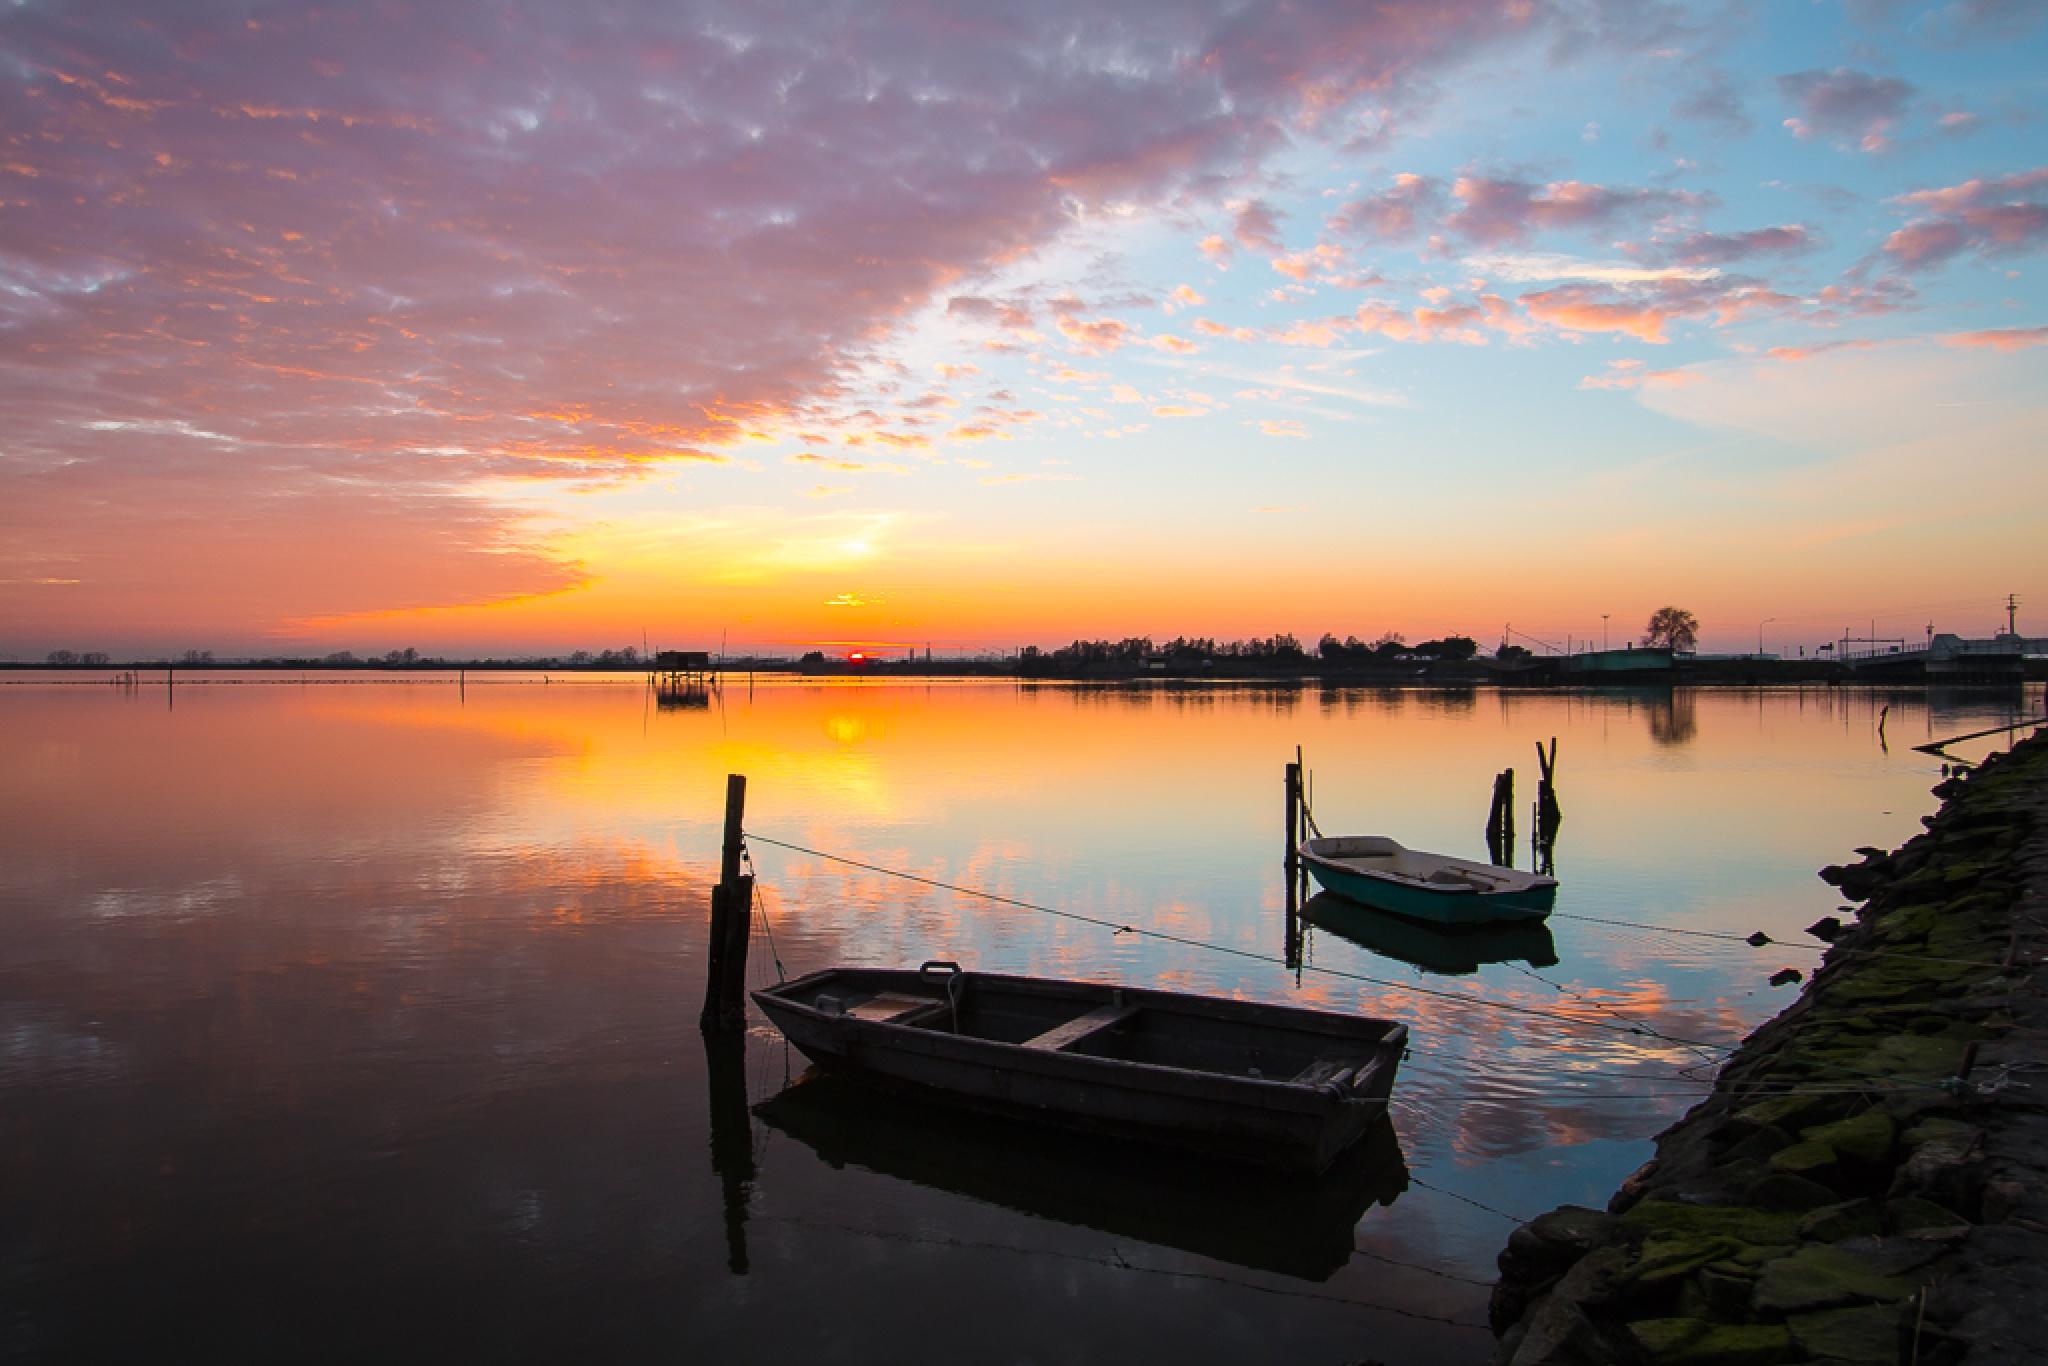 lagoon sunset by Francesco Monari